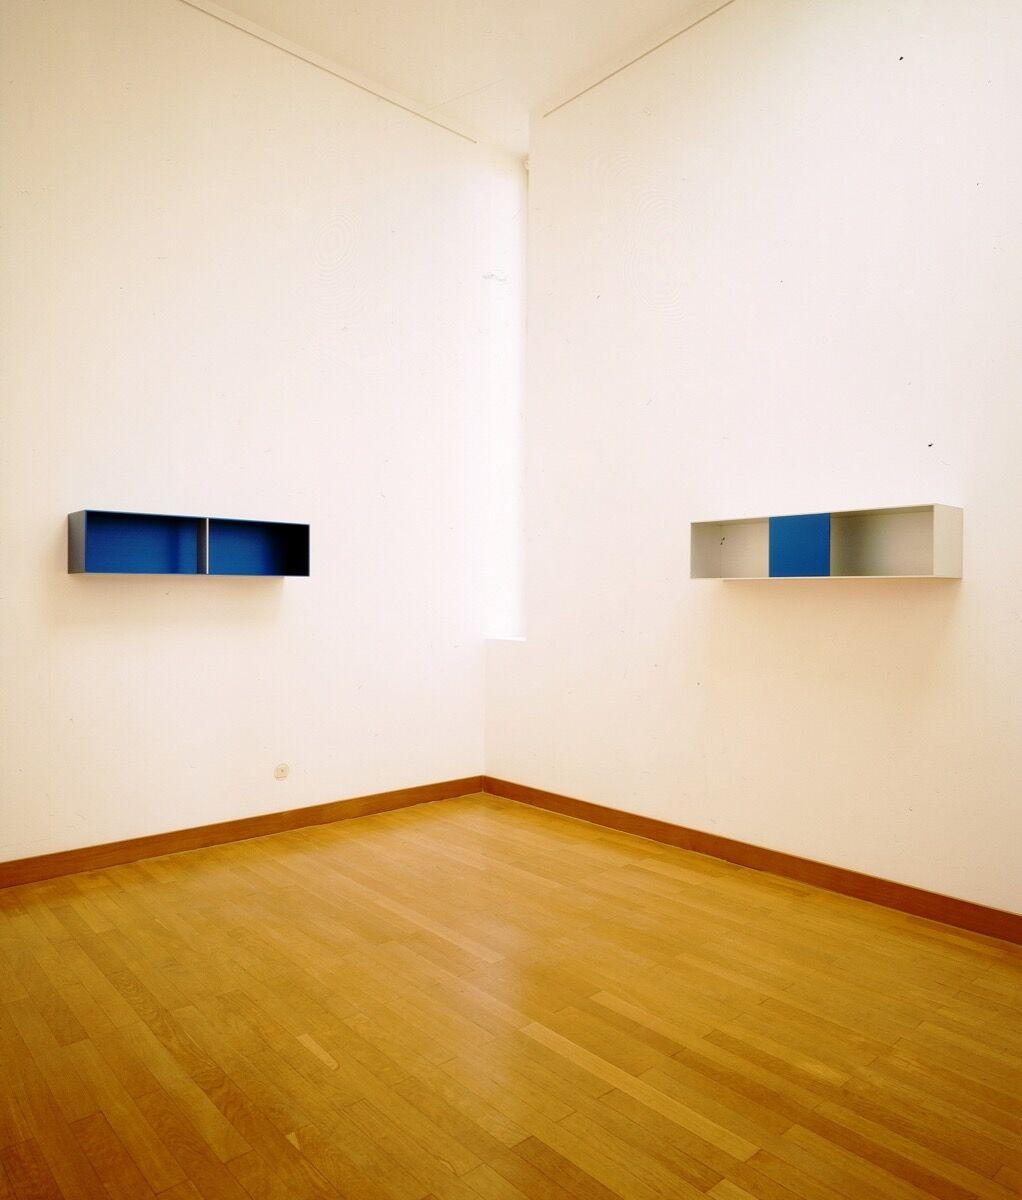 Donald Judd, Untitled, 1991. Donald Judd ©Judd Foundation. Courtesy of Galerie Gmurzynska.